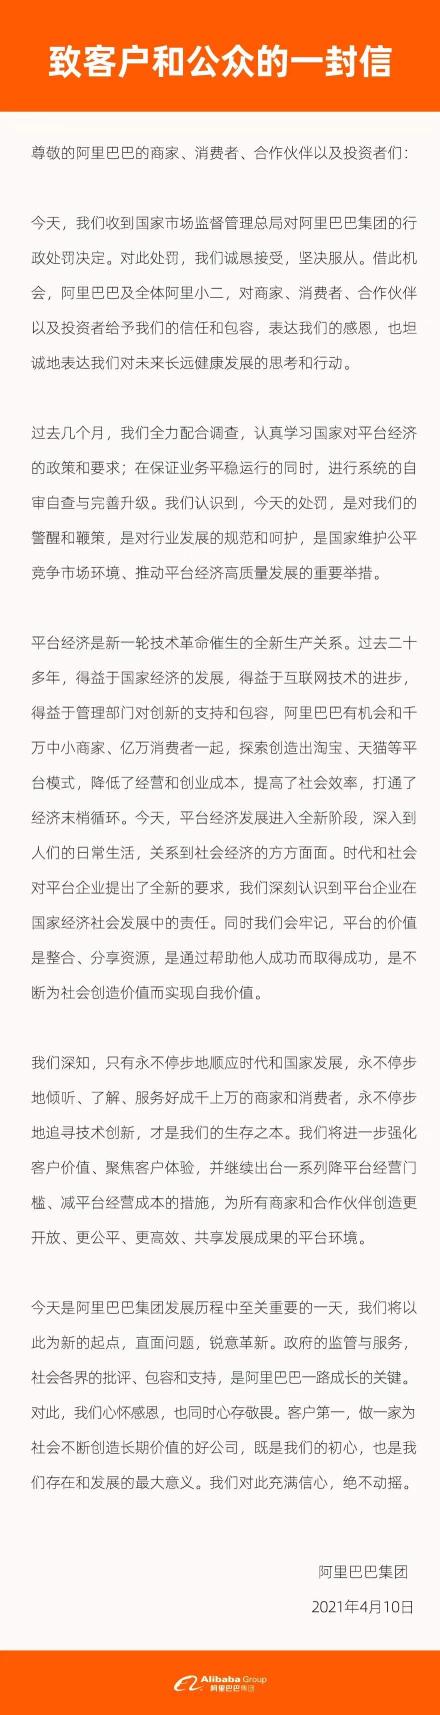 C:\Users\qqzhu\Documents\WeChat Files\wxid_k2djsgnwttgp22\FileStorage\Temp\cabf154e89be4647afc3157b99628154.png